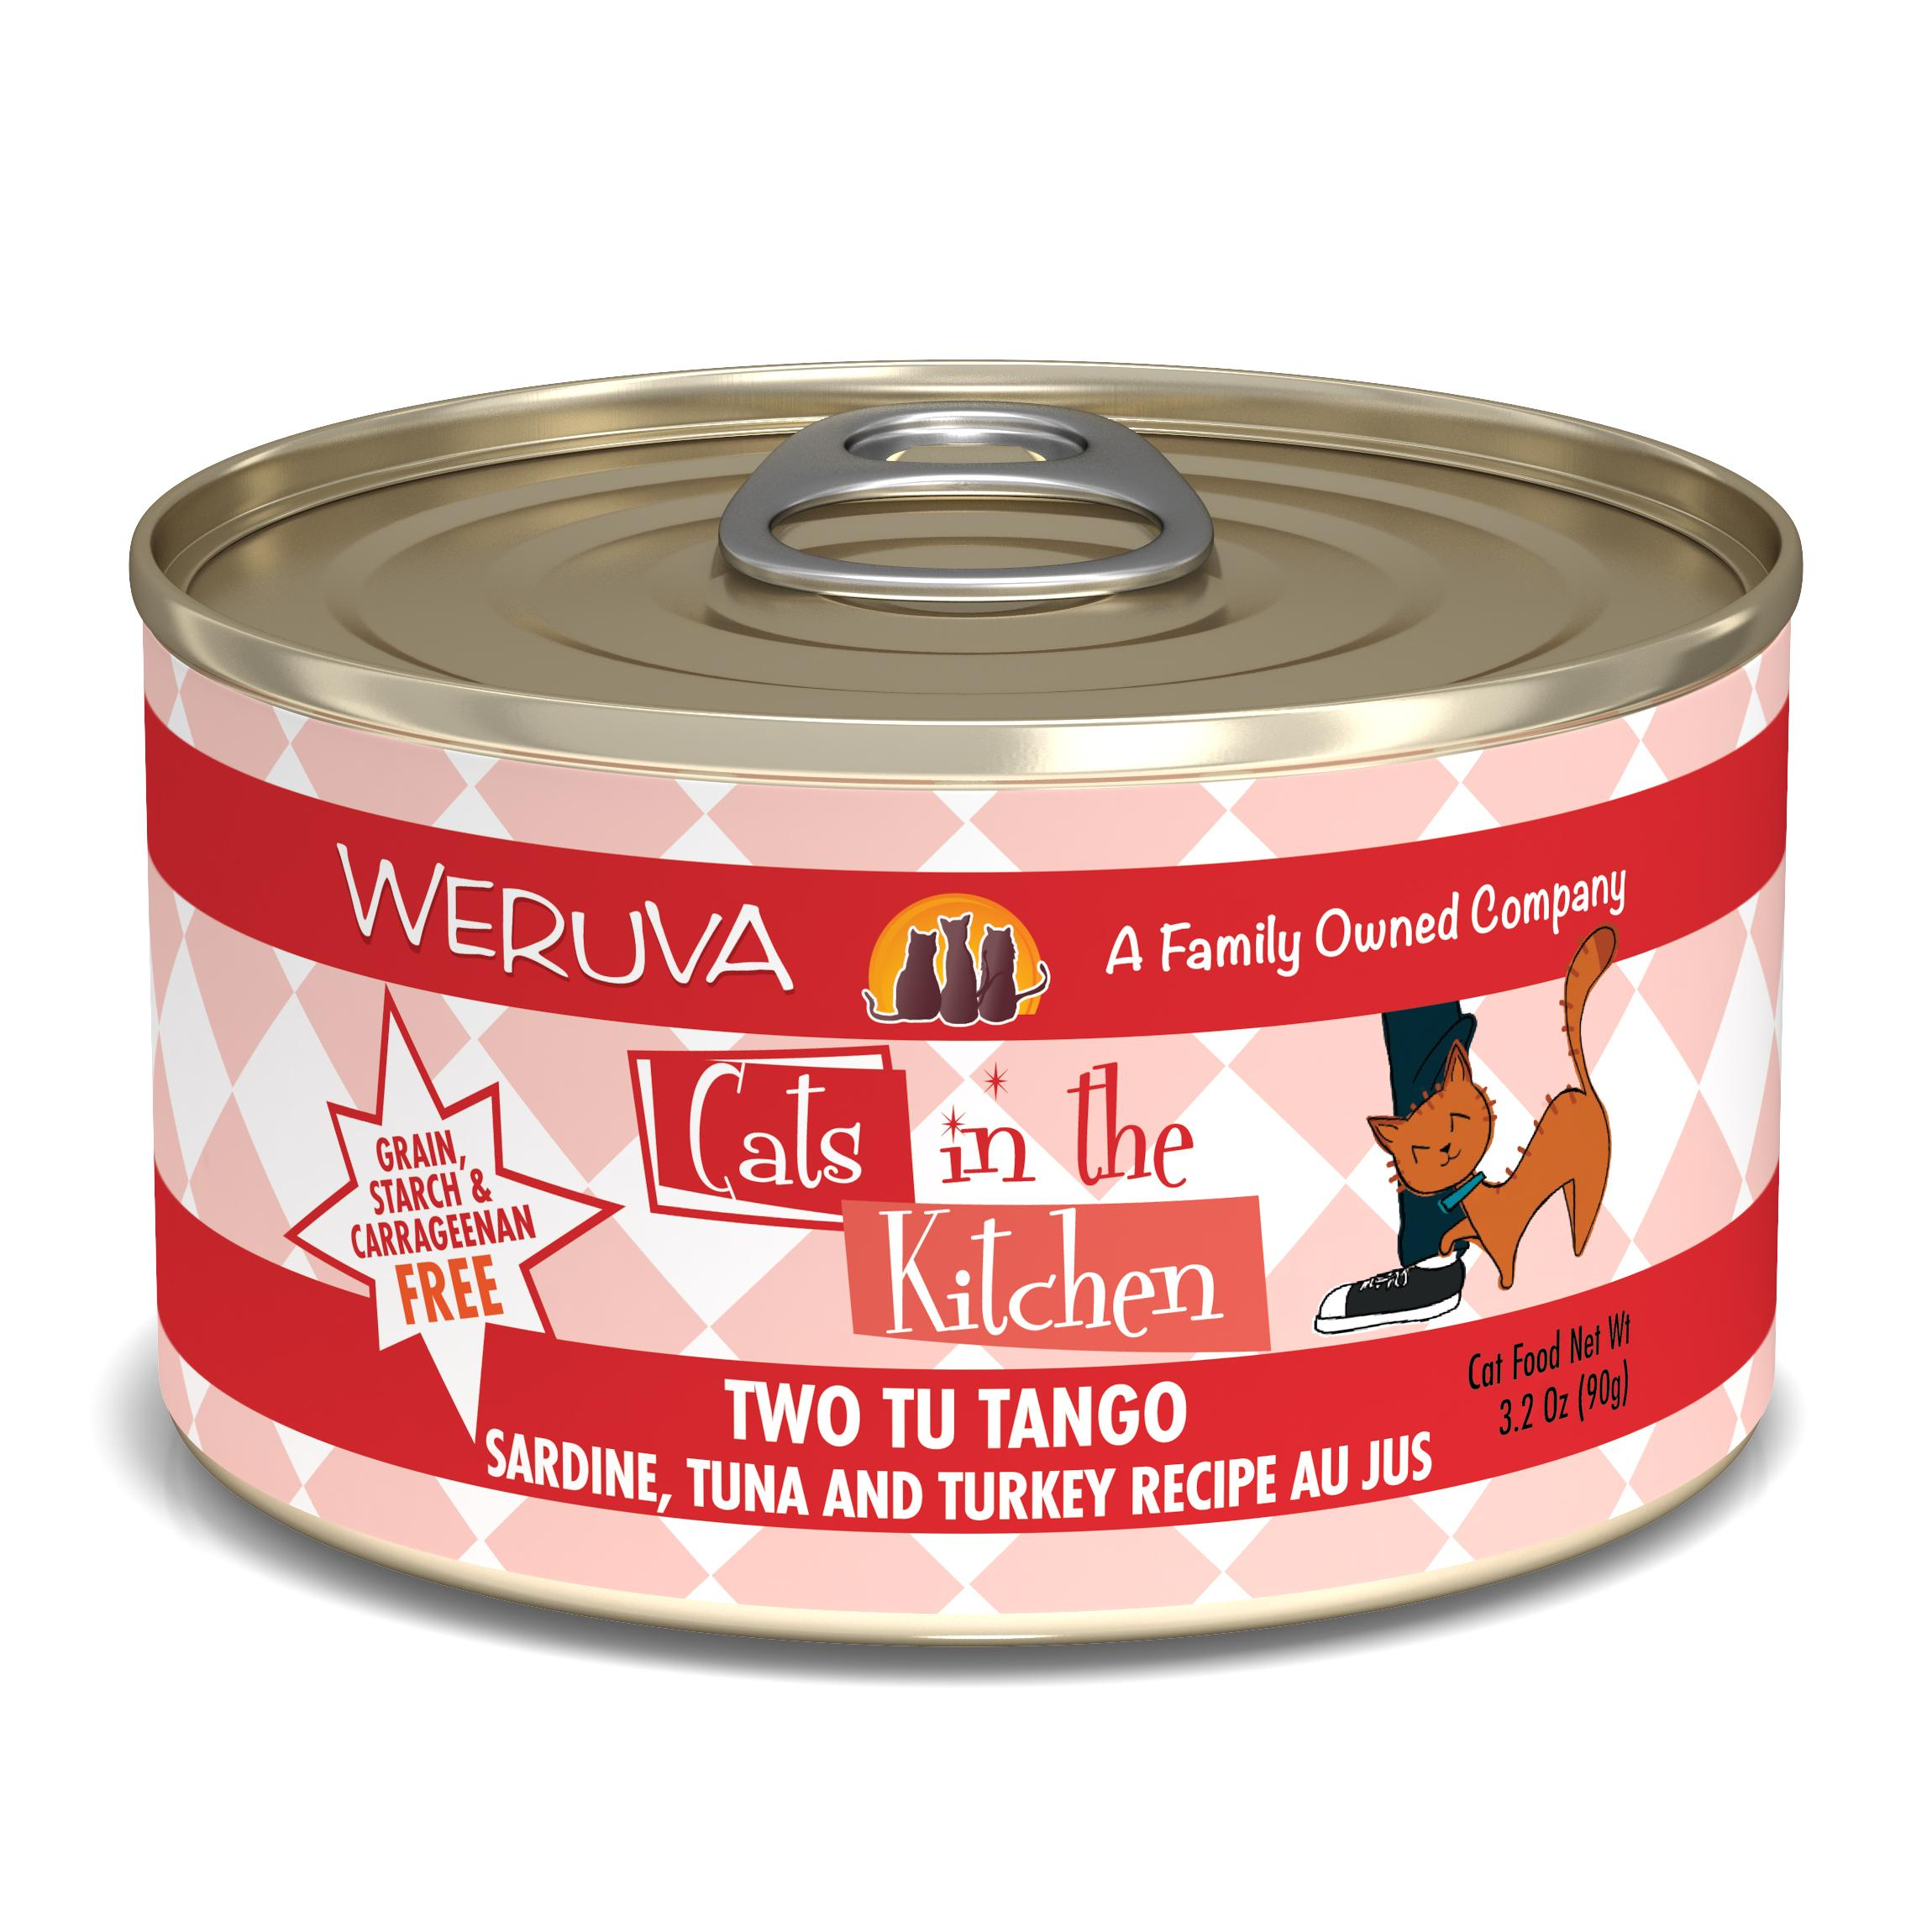 Weruva Cats in the Kitchen Two Tu Tango Sardine, Tuna & Turkey Au Jus Grain-Free Wet Cat Food Image